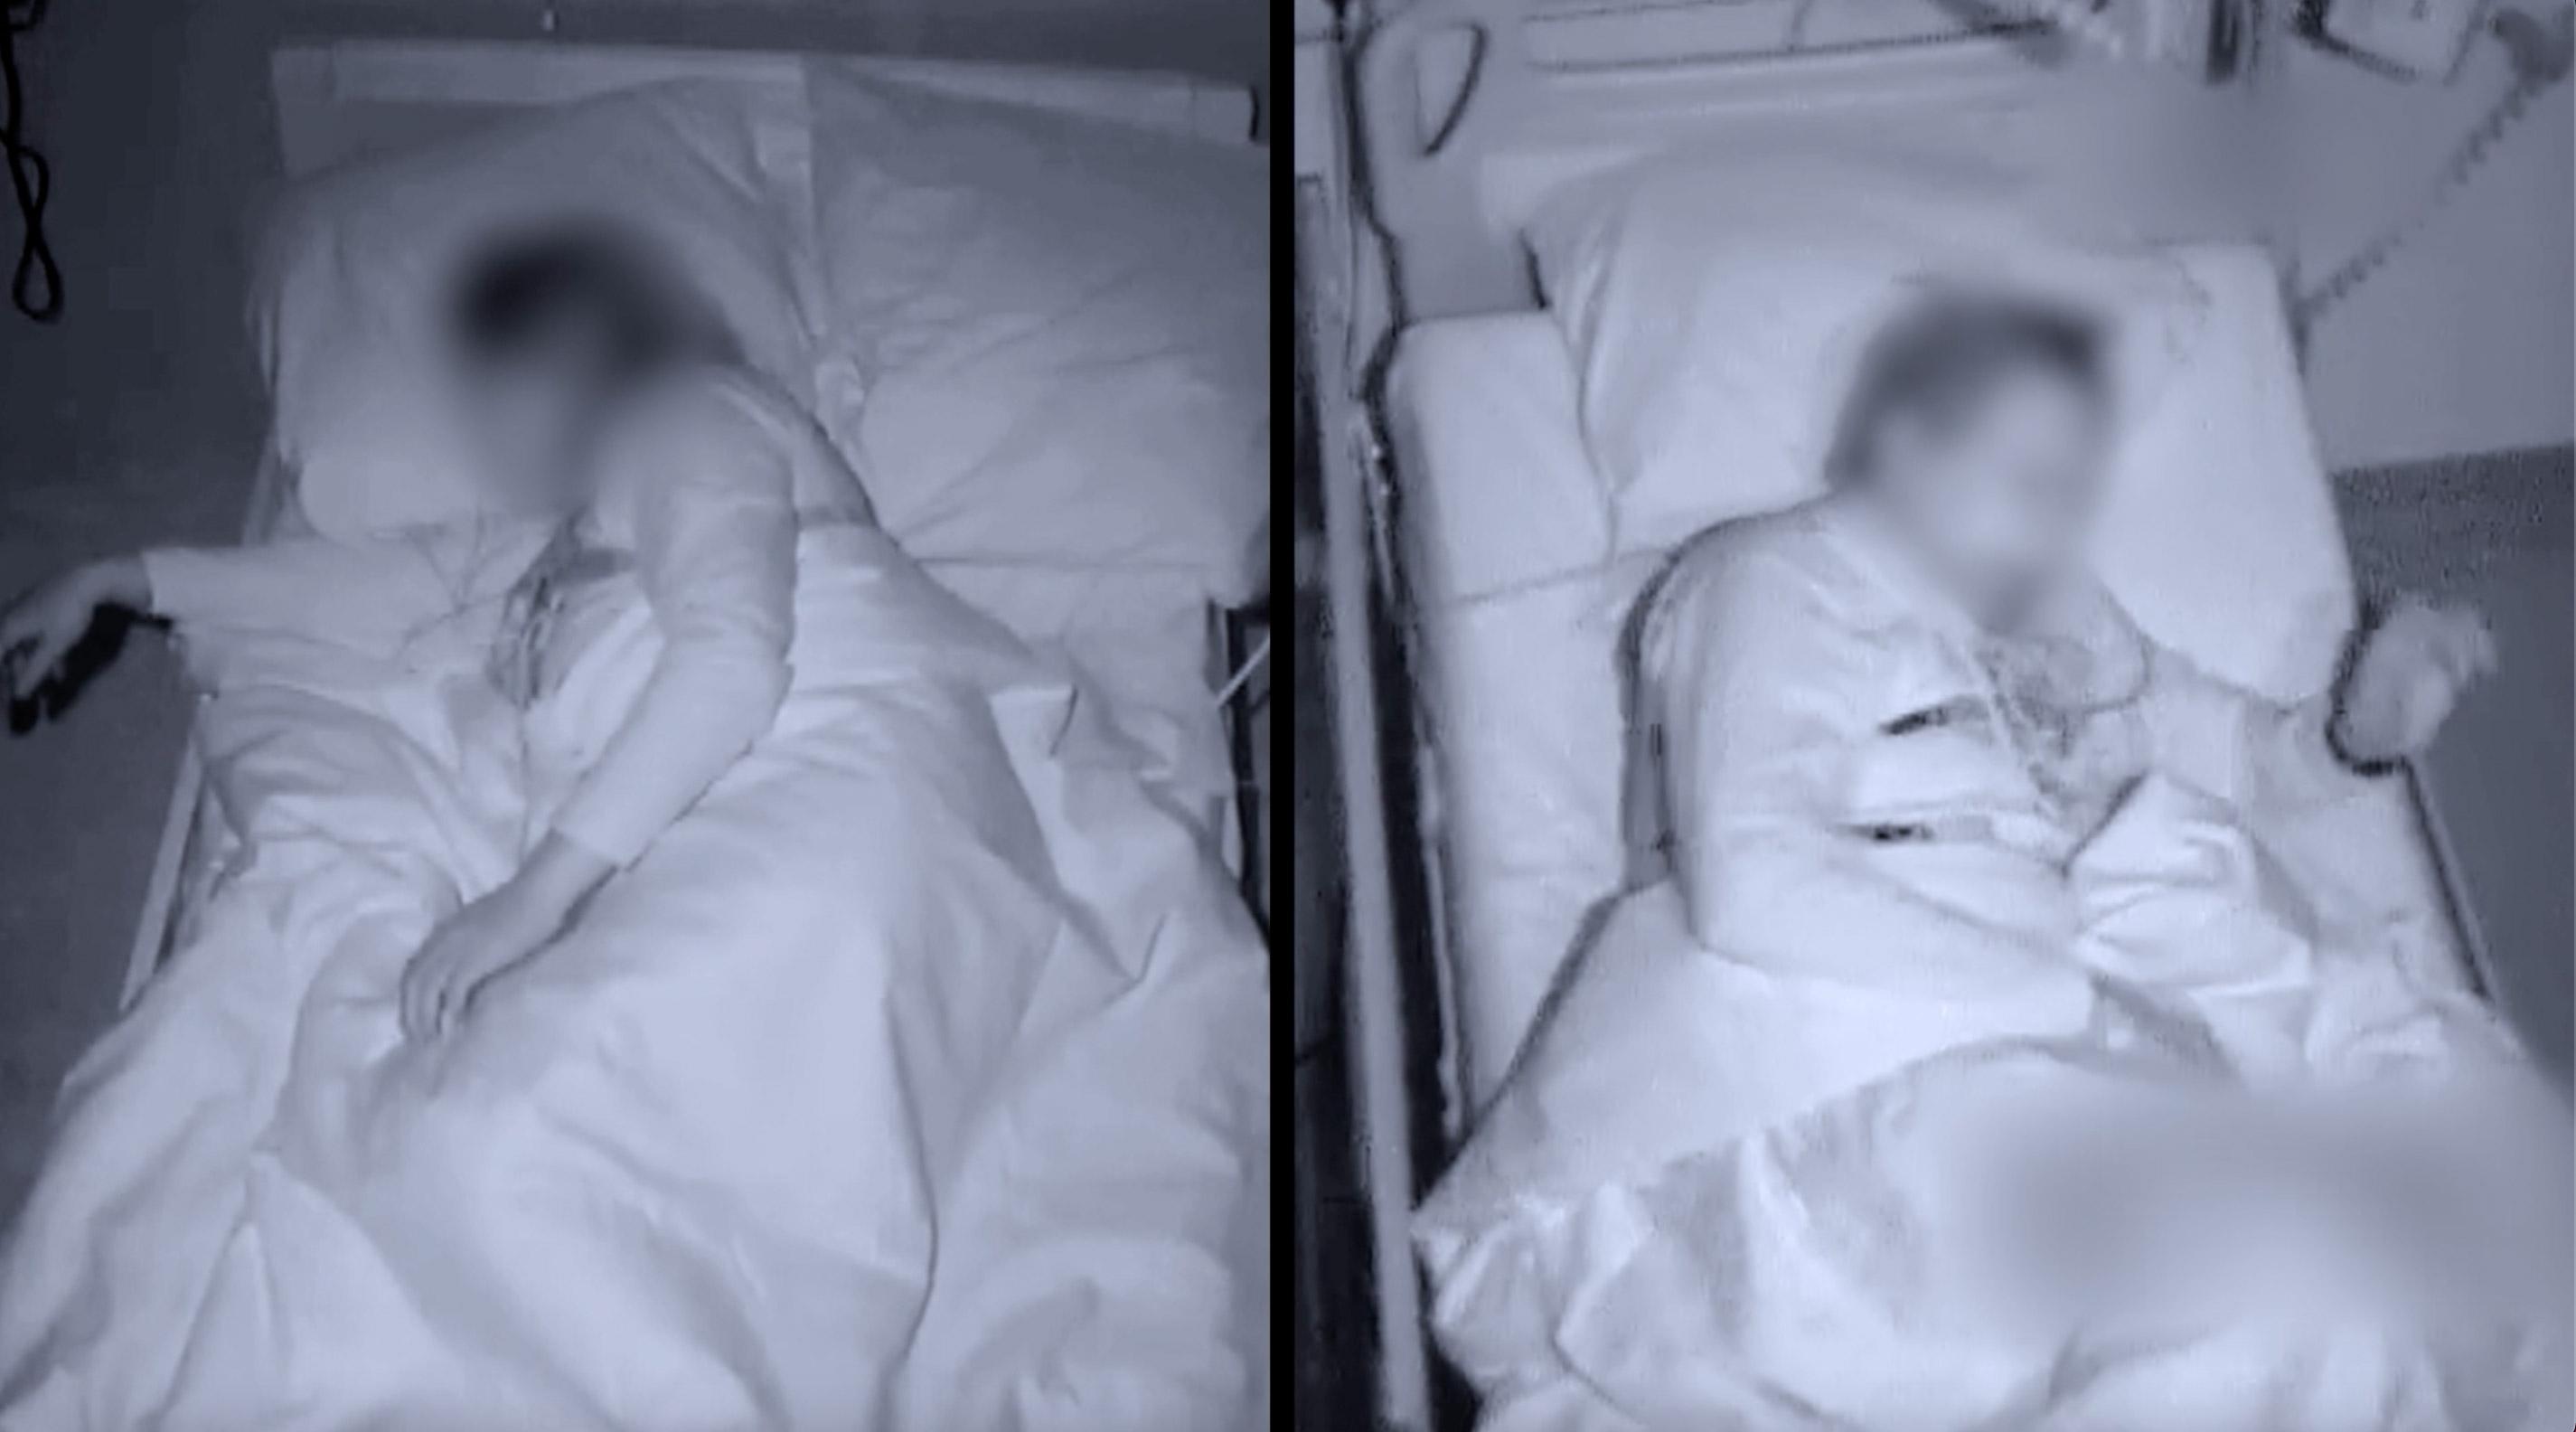 footage from the sleep lab